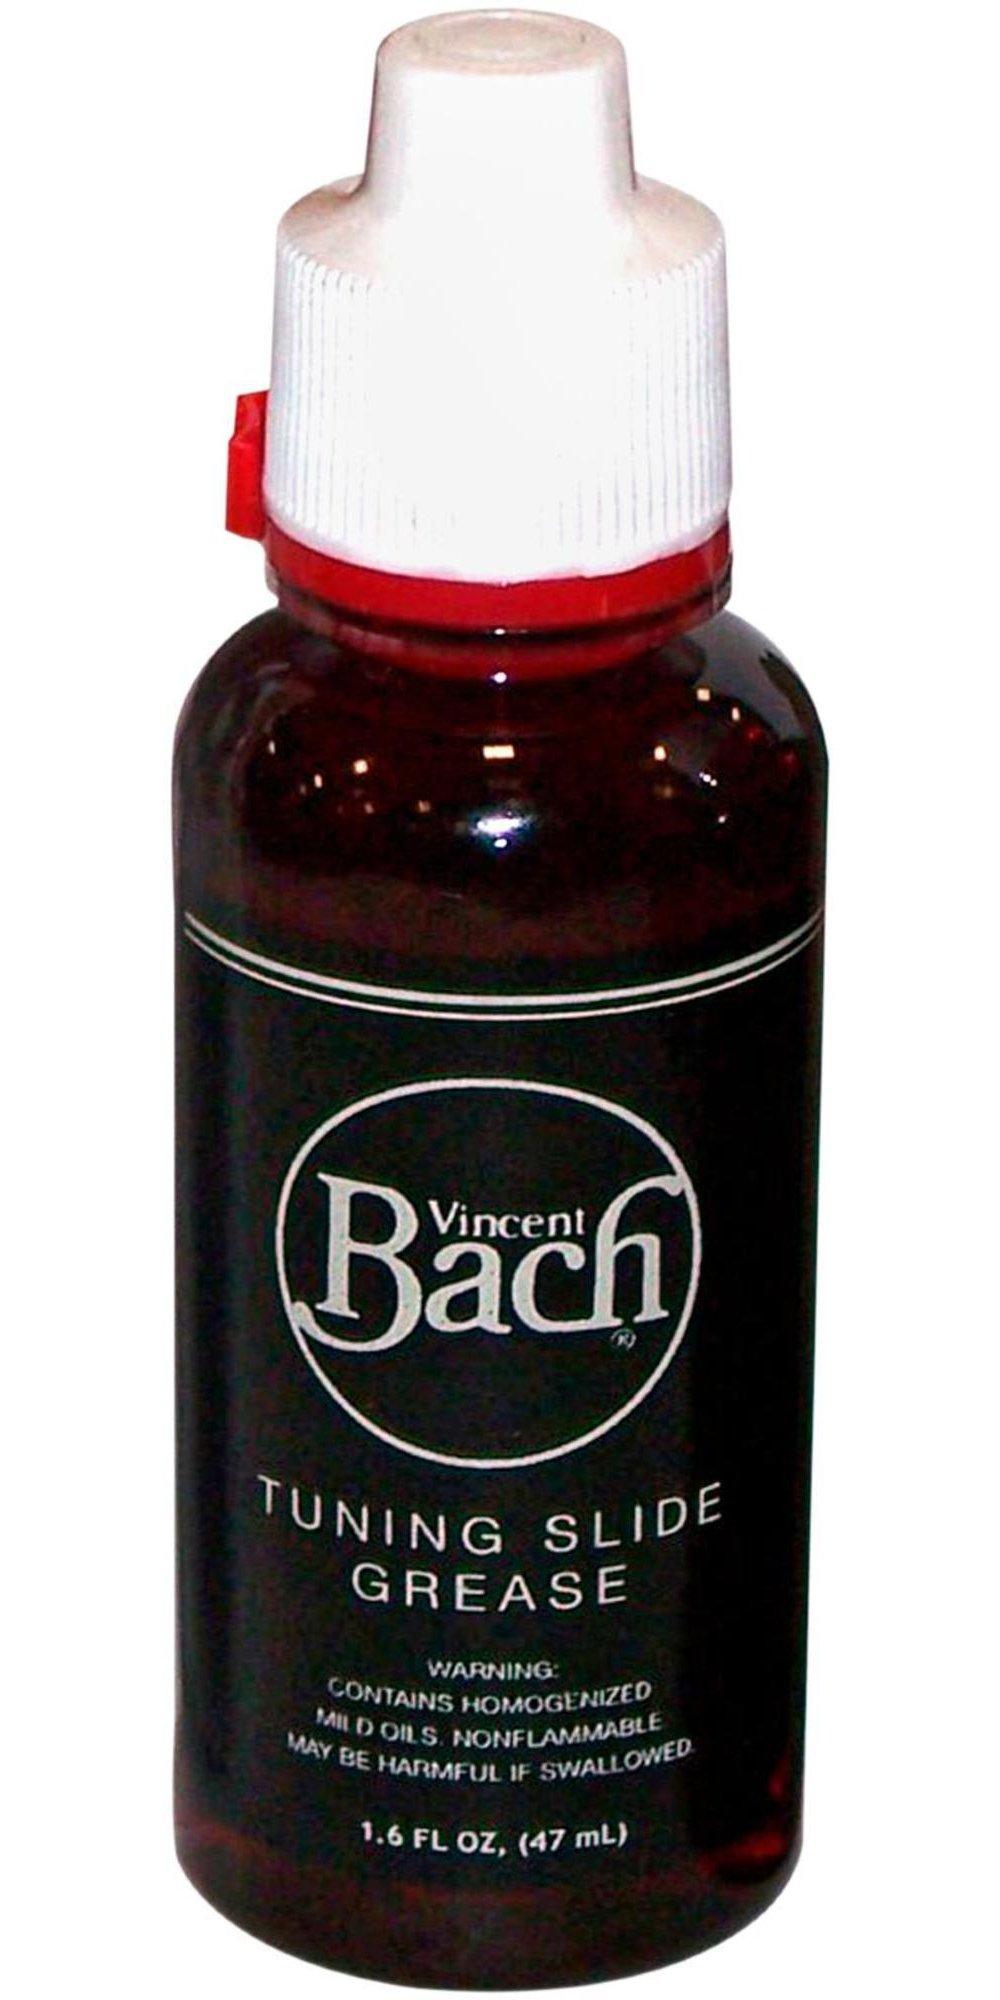 Bach Tuning Slide Grease 1.6 oz. Bottle